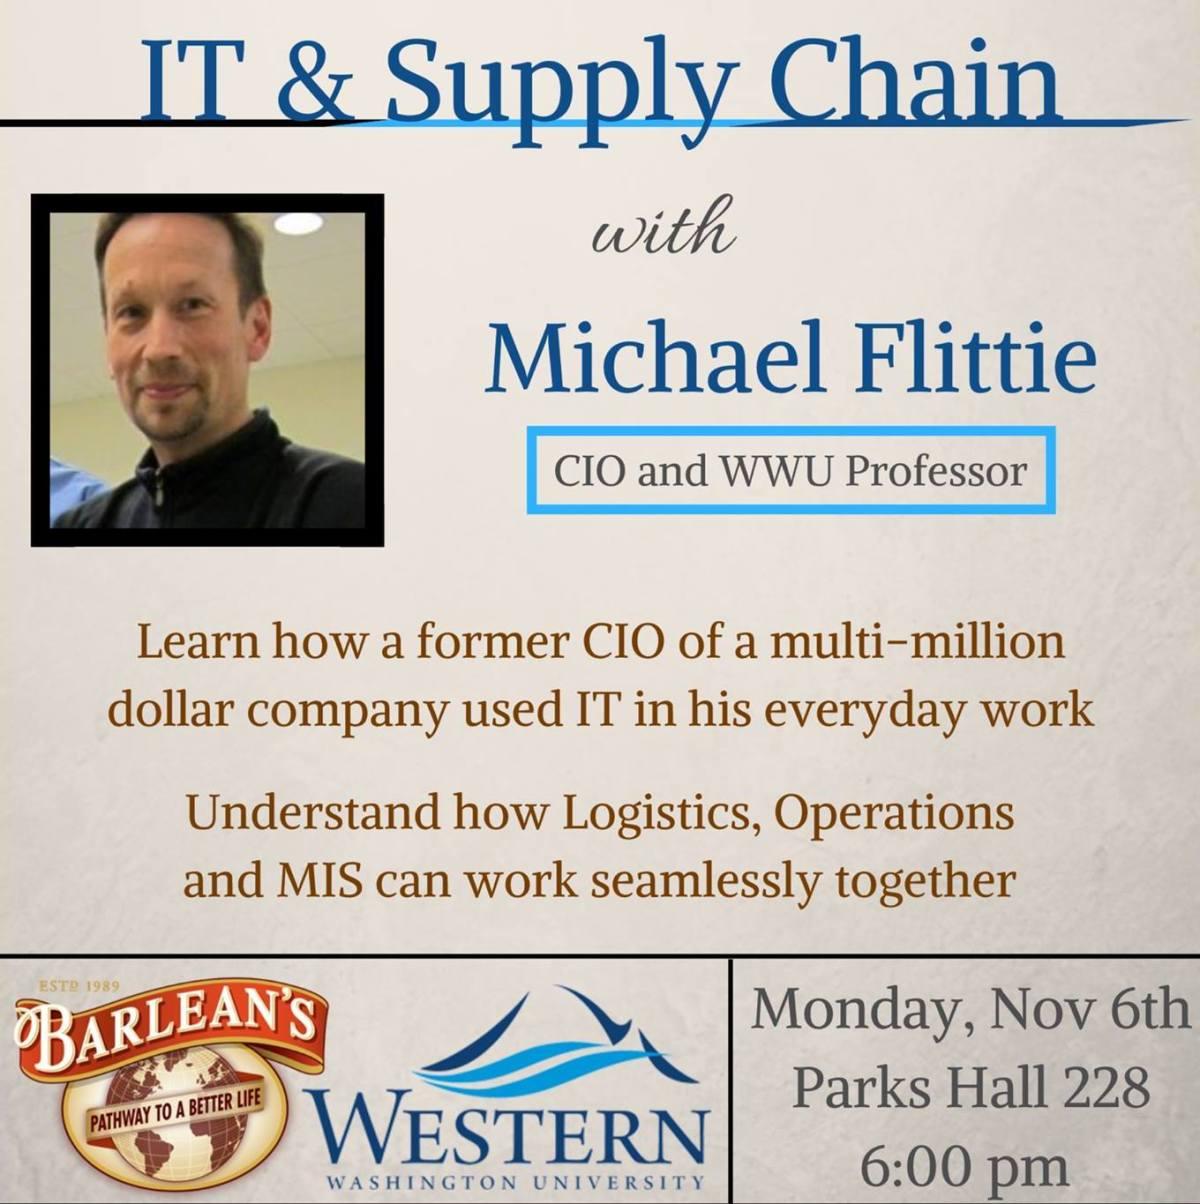 CIO & WWU Professor: MichaelFlittie